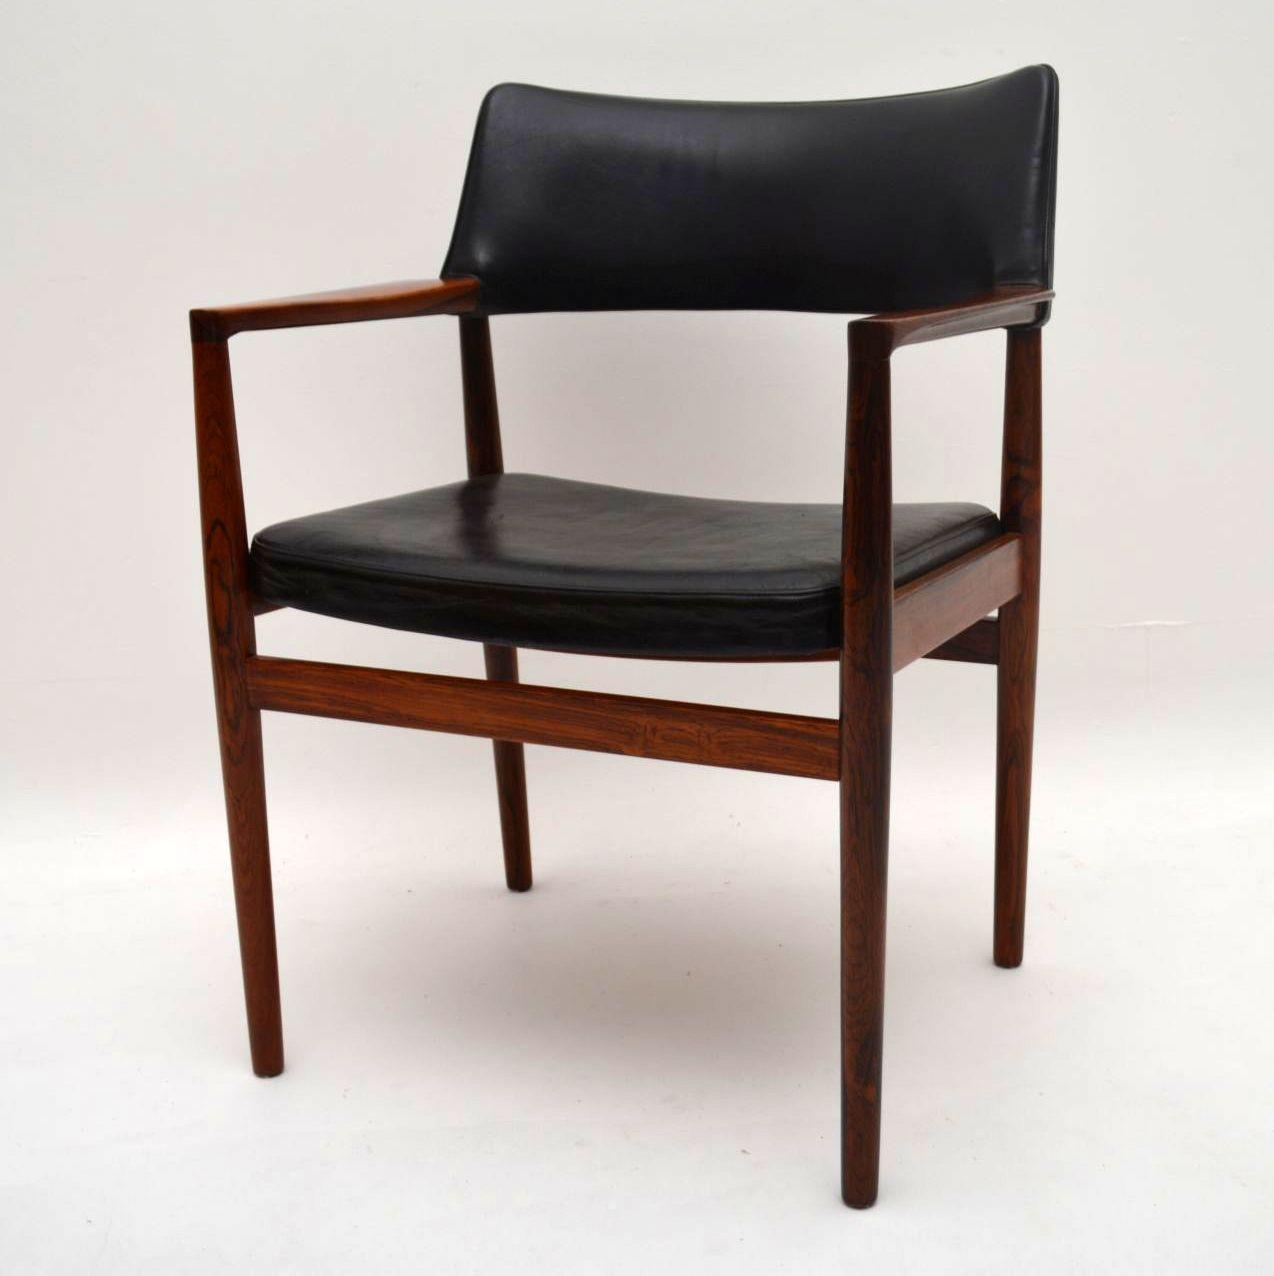 Danish Rosewood & Leather Retro Armchair Vintage 1960's